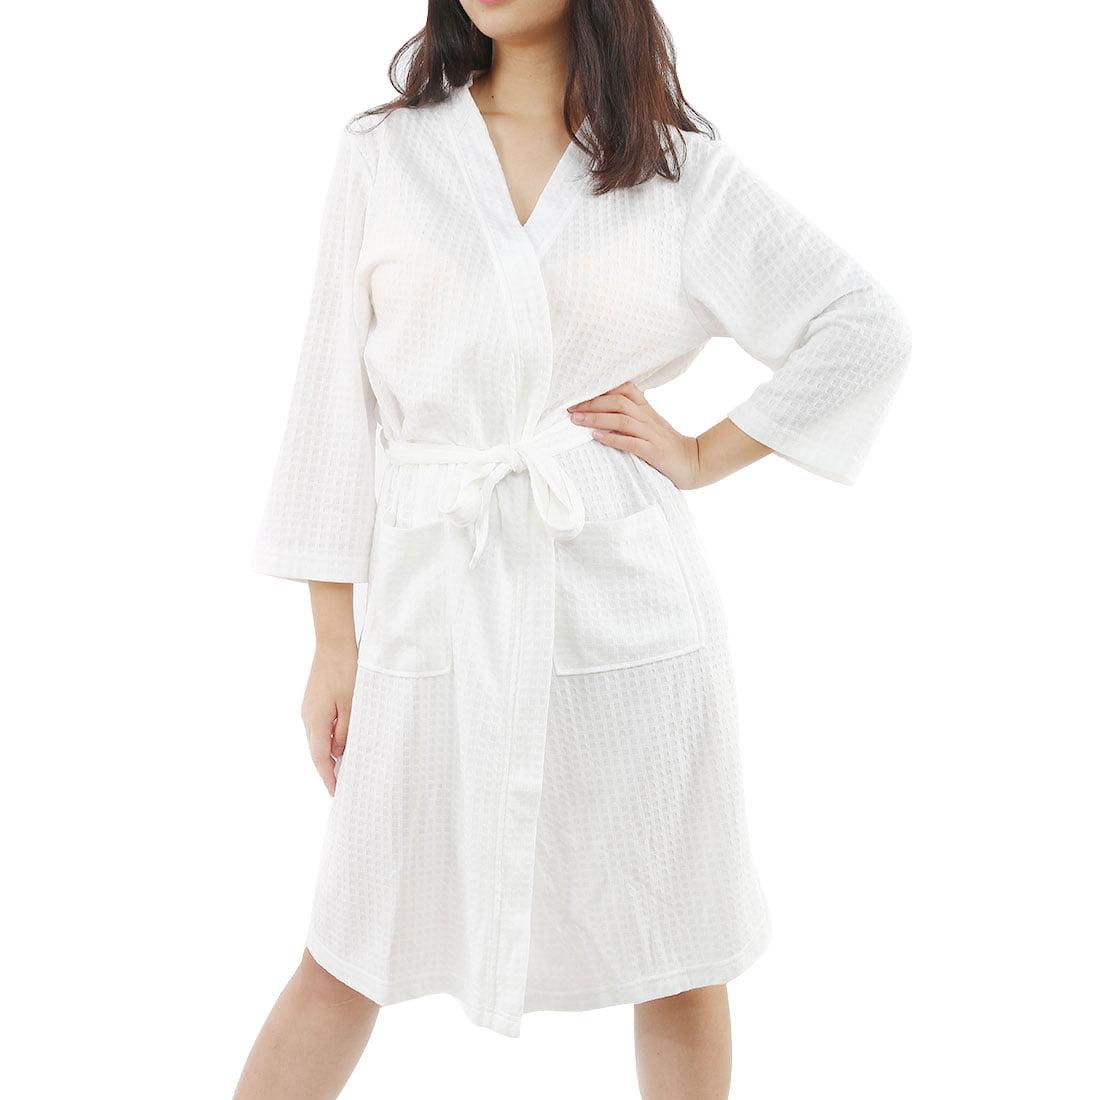 c63d13d09d Women s Turkish Cotton Lightweight Waffle Kimono Short Robe S M White